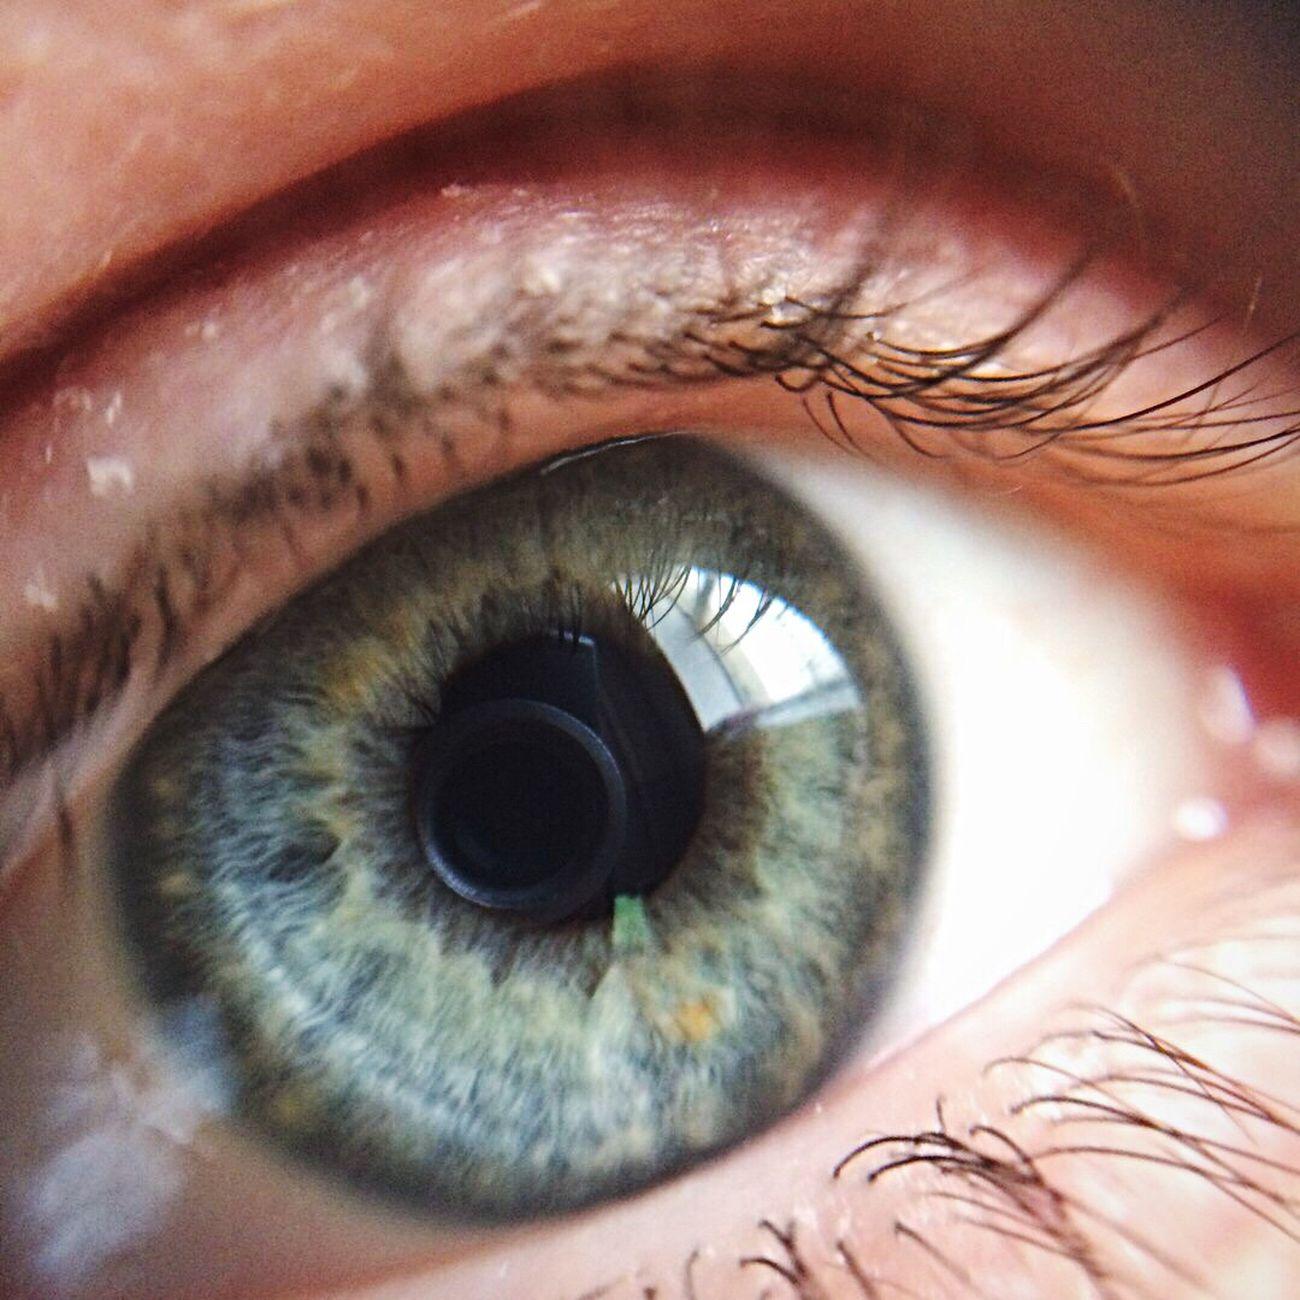 Eye Myeyes Human Eye Eyelash Close-up Real People Human Body Part One Person Eyeball Sensory Perception Eyesight Vision Day People First Eyeem Photo